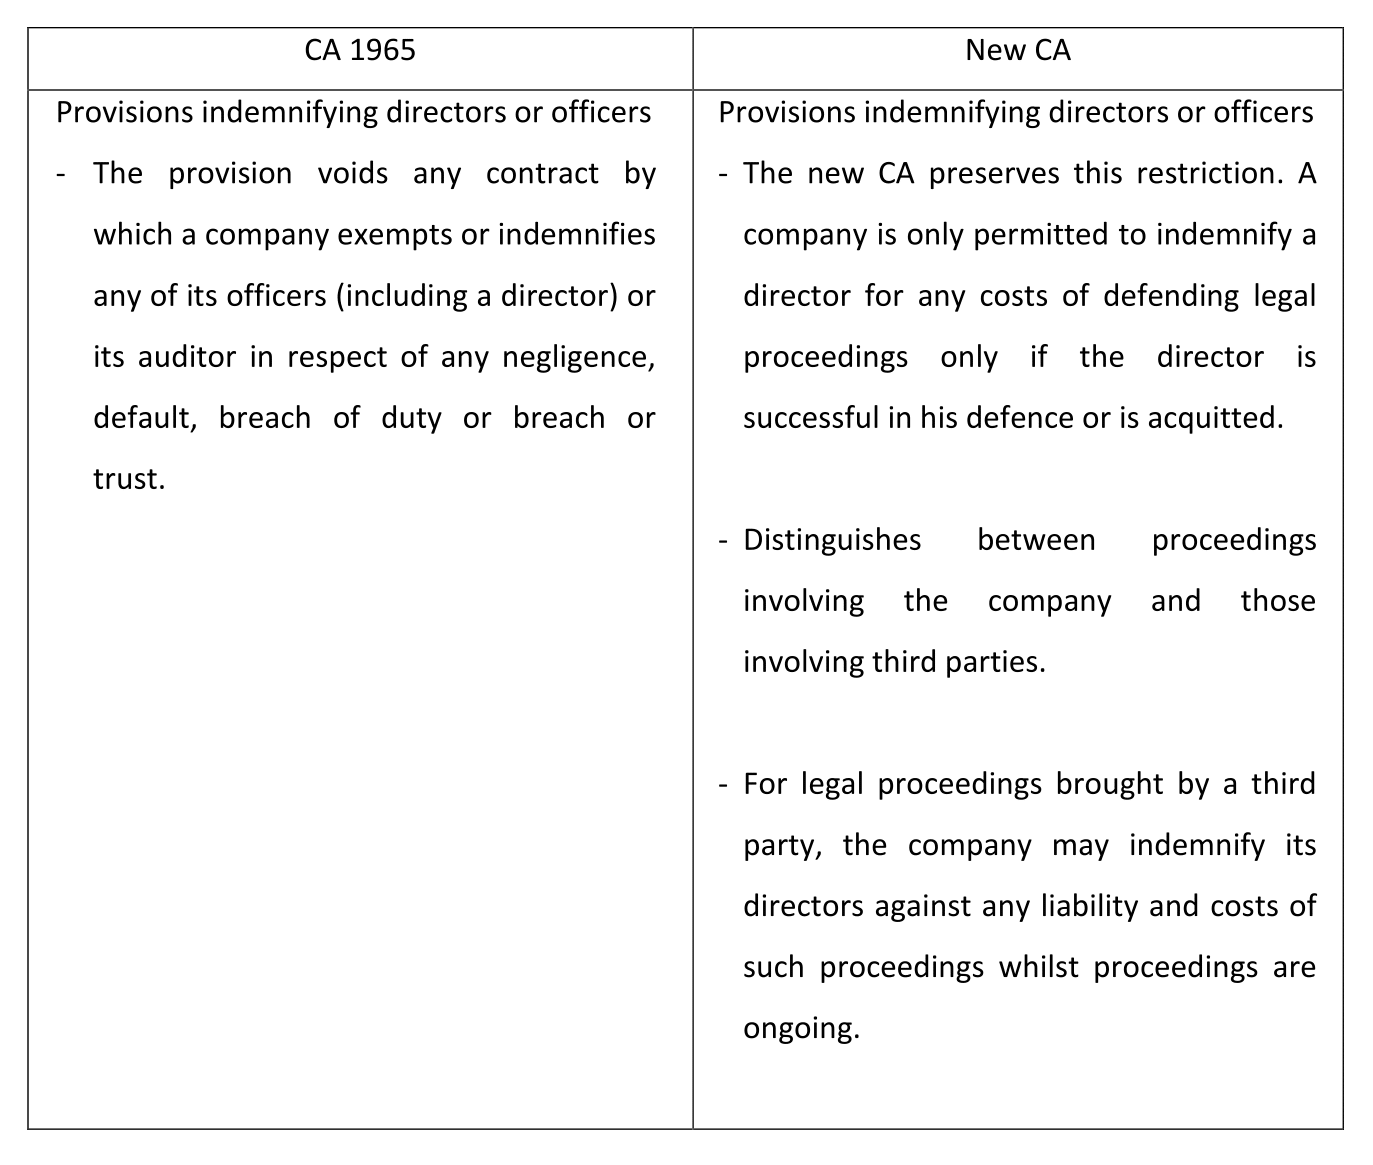 fiduciary duties of directors companies act 1965